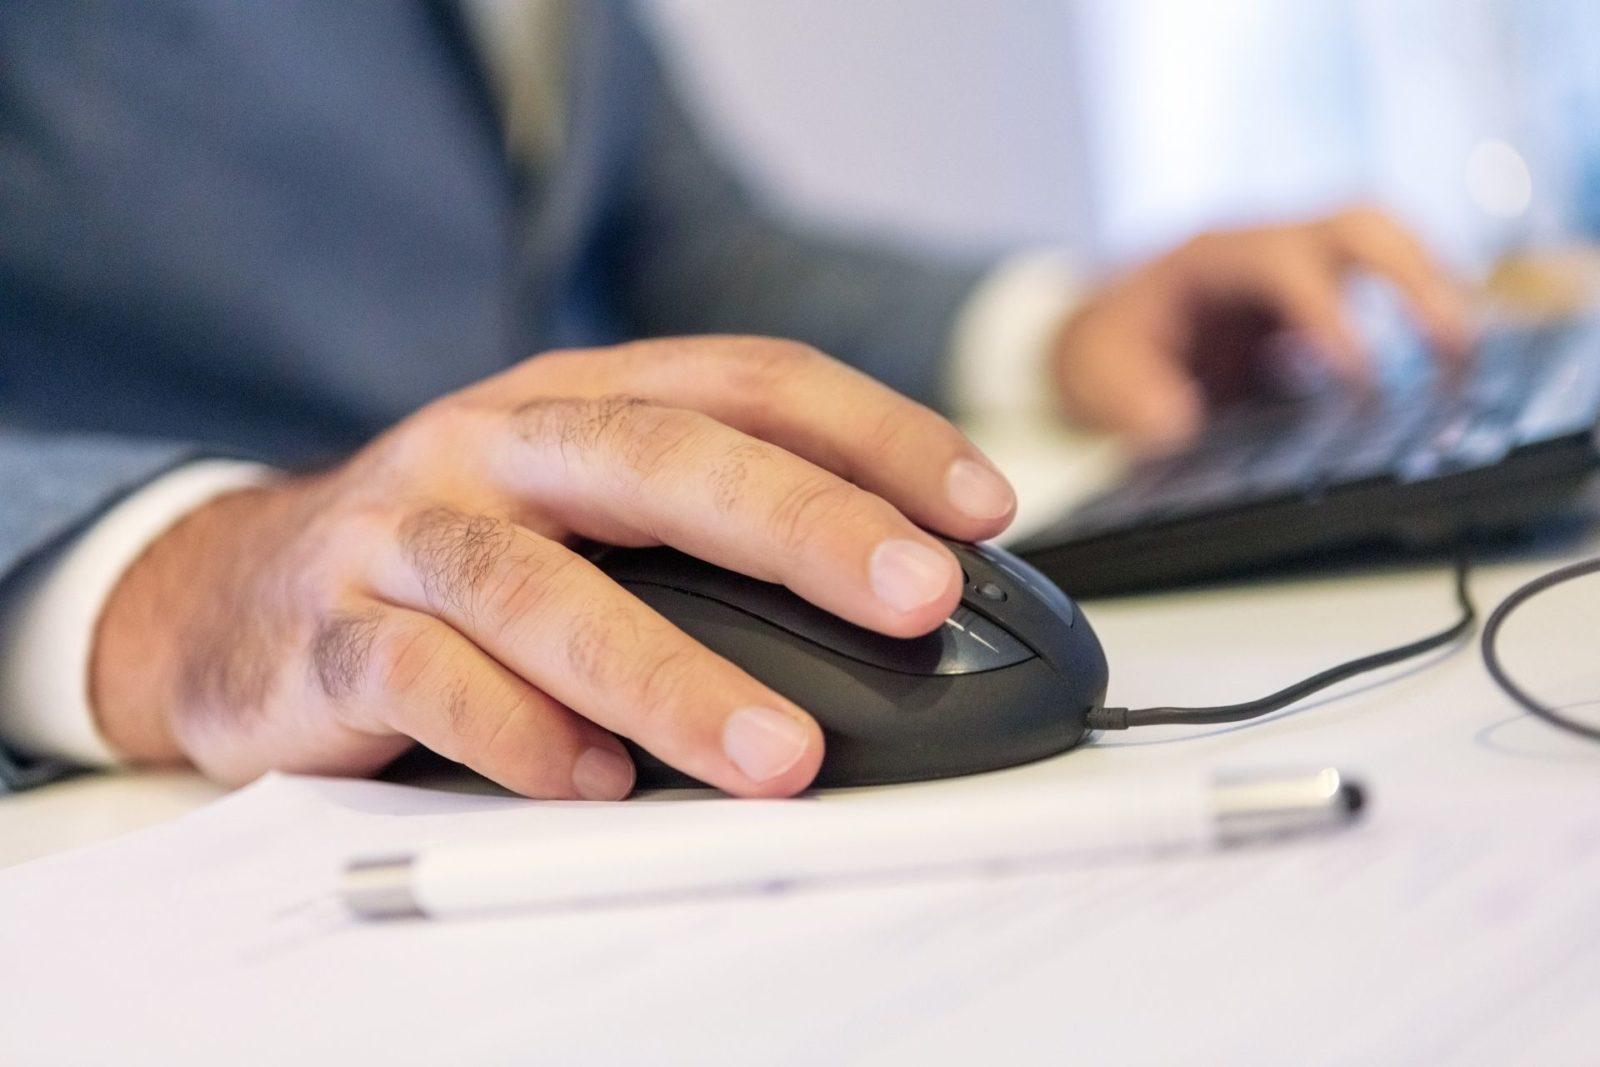 maos mouse computador consulta precatorios processo eletronico internet